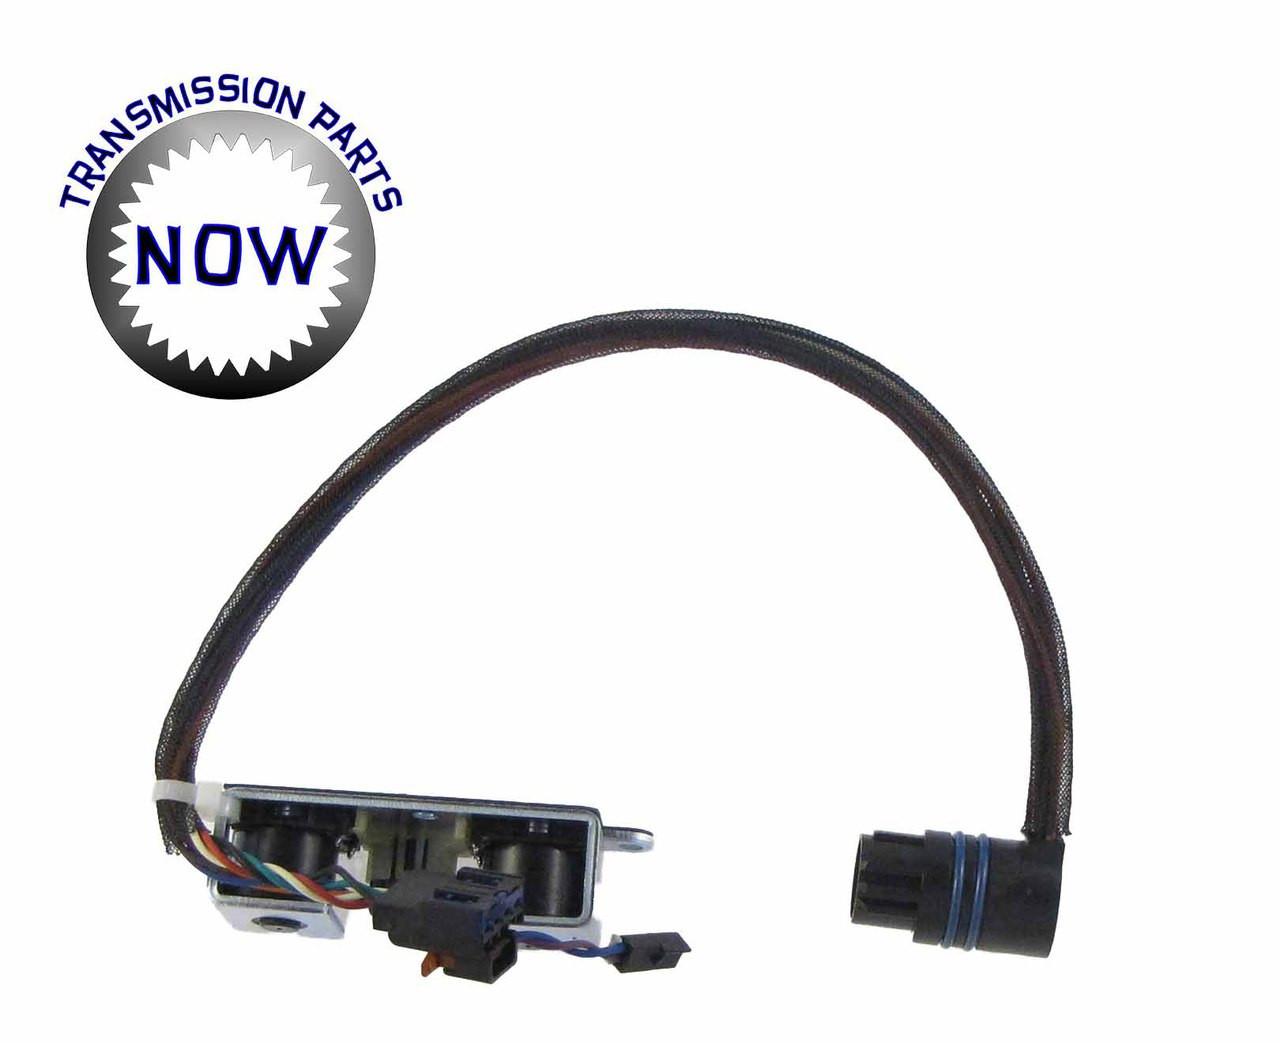 small resolution of 4r75w transmission valve body diagram c5 transmission 4l60e accumulator installation 4l60e transmission wiring connector diagram